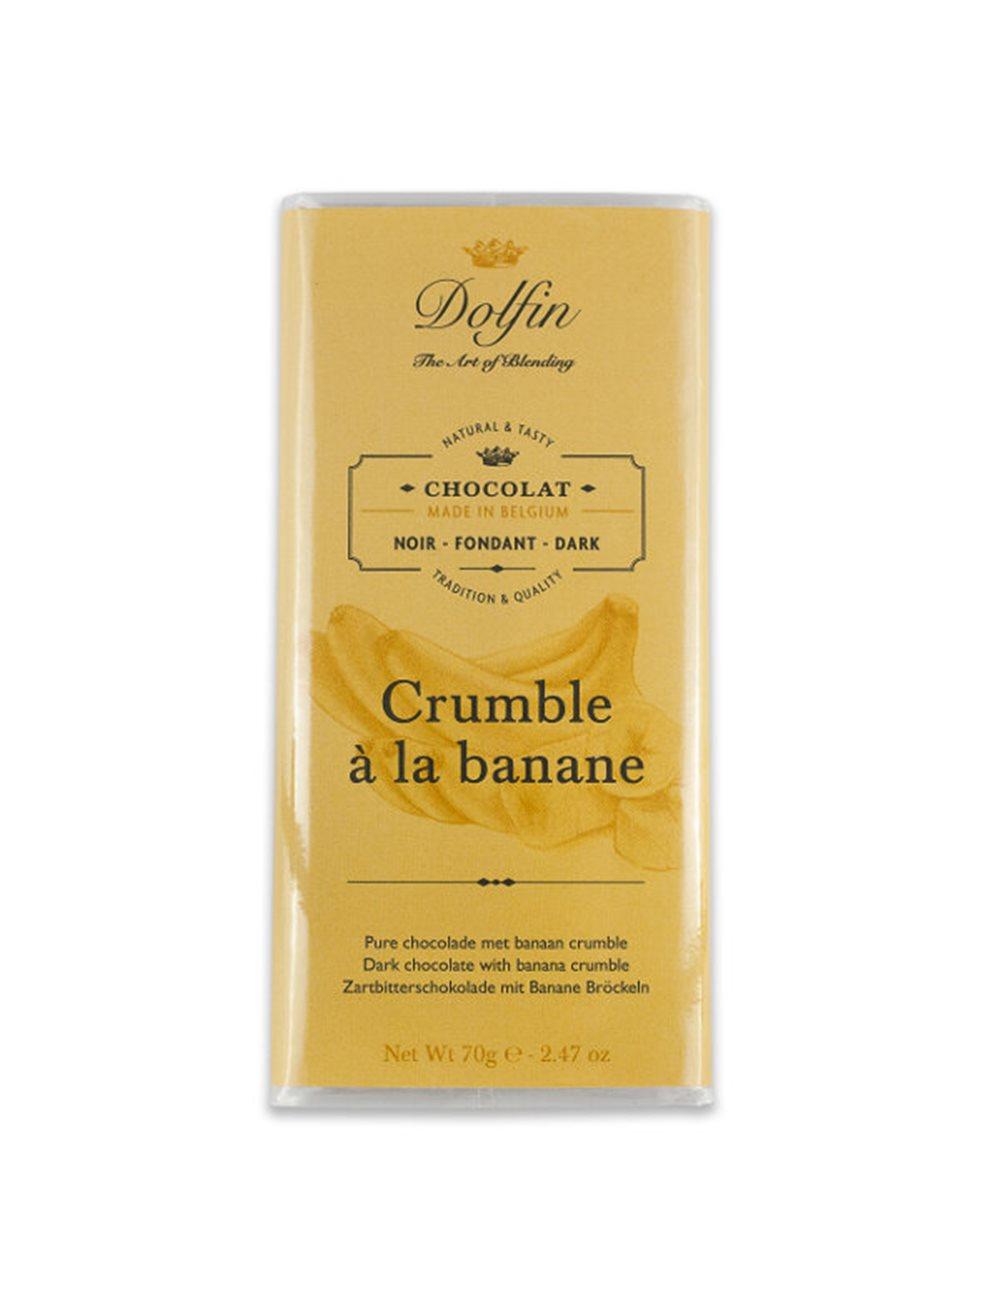 Zwarte chocolade 60% met bananencrumble 70g